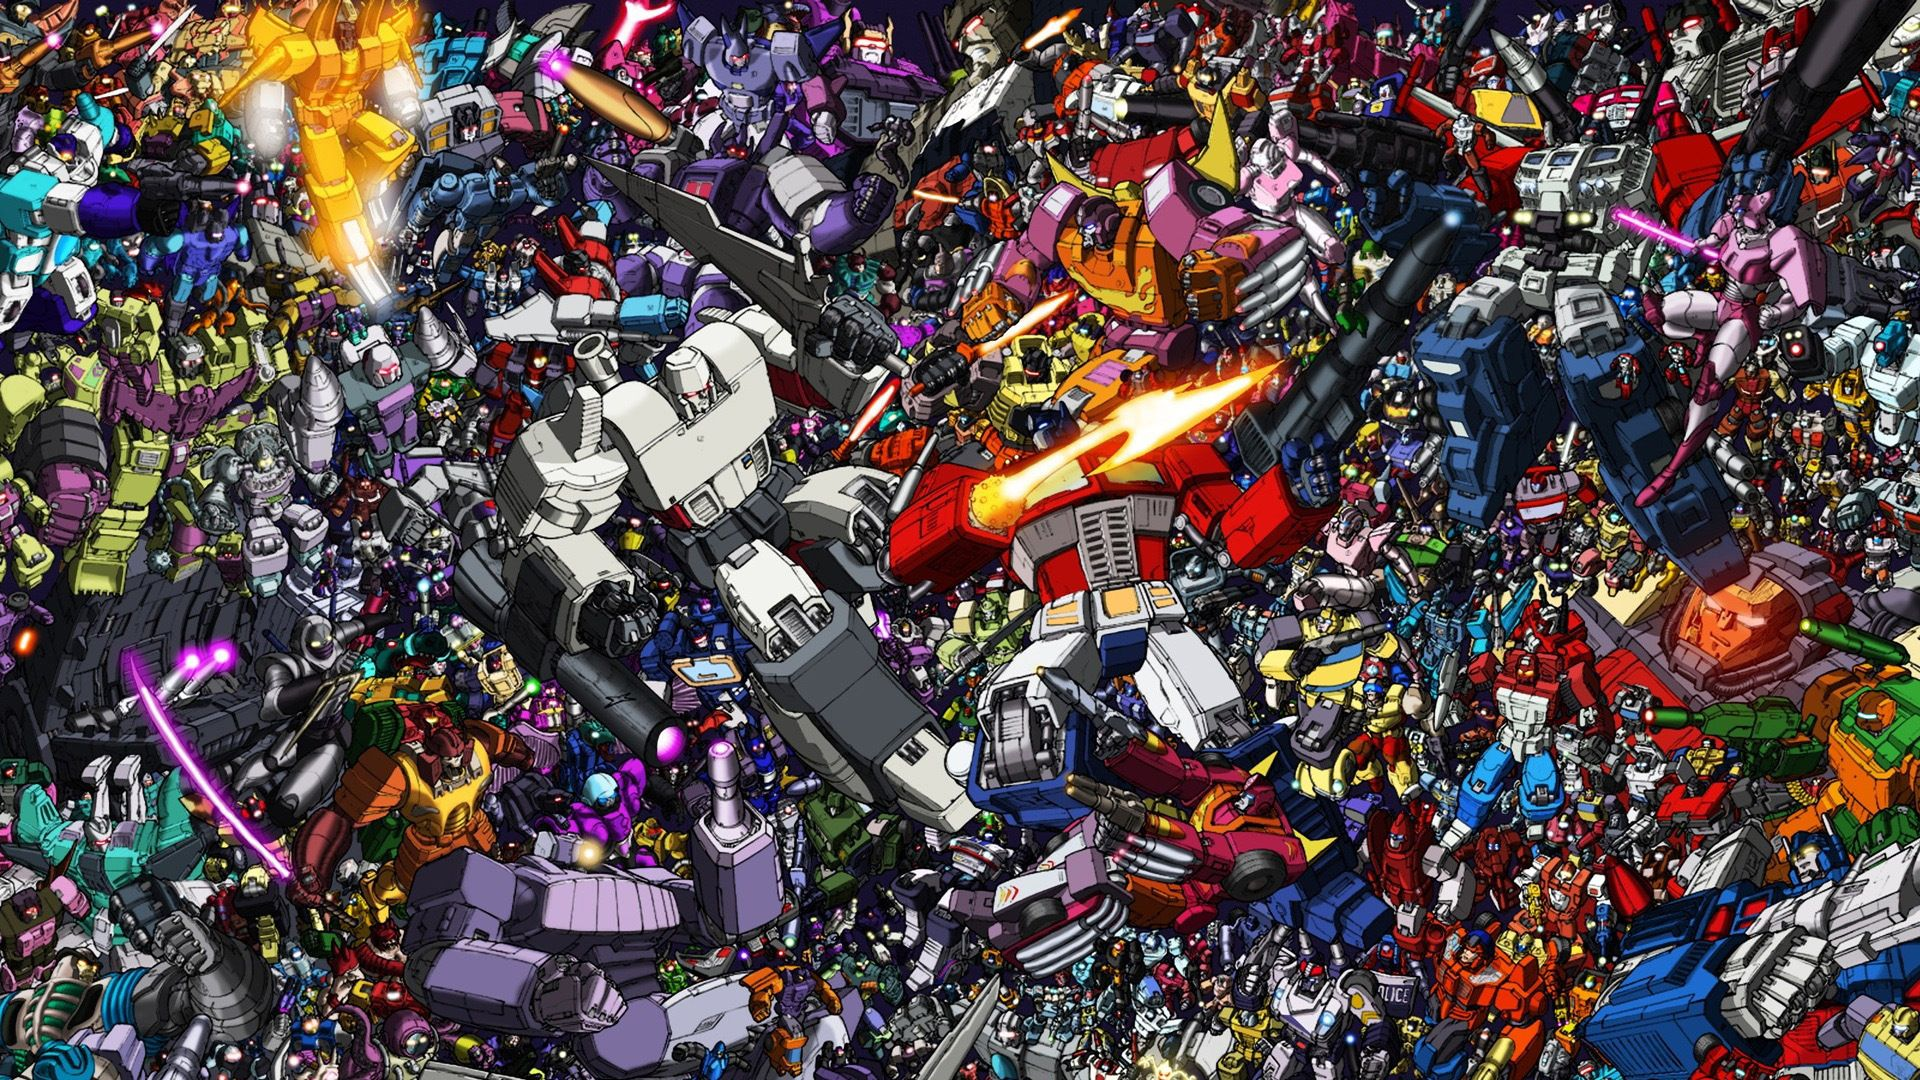 Transformers G1 Wallpaper Transformers Canvas Cartoon Wallpaper Transformers Artwork